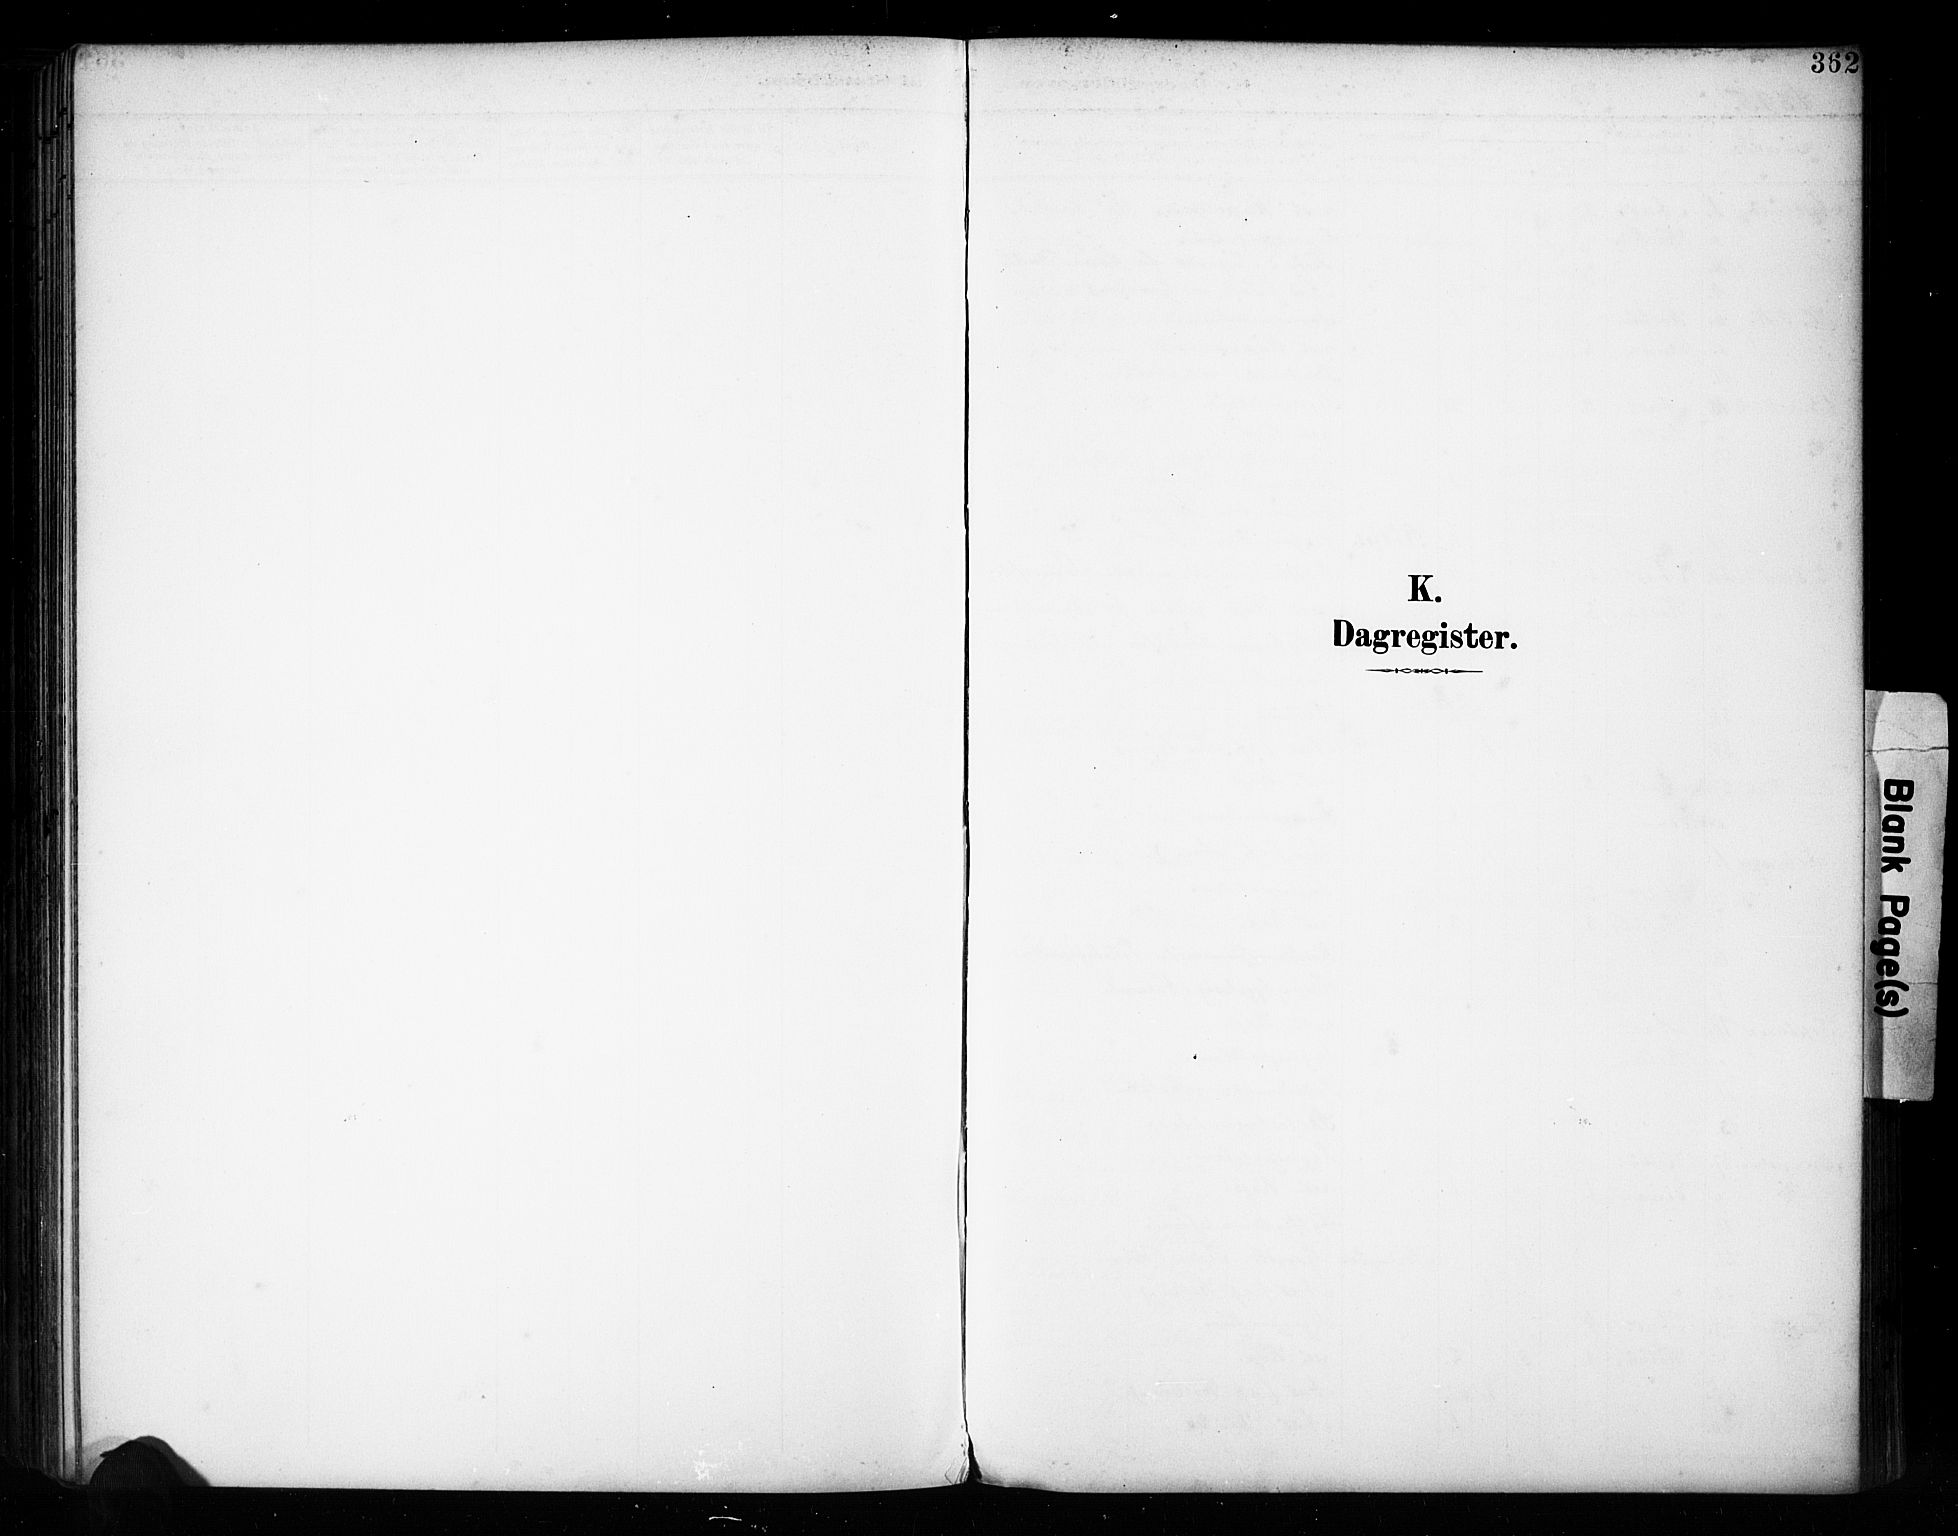 SAH, Vestre Toten prestekontor, H/Ha/Haa/L0011: Ministerialbok nr. 11, 1895-1906, s. 362